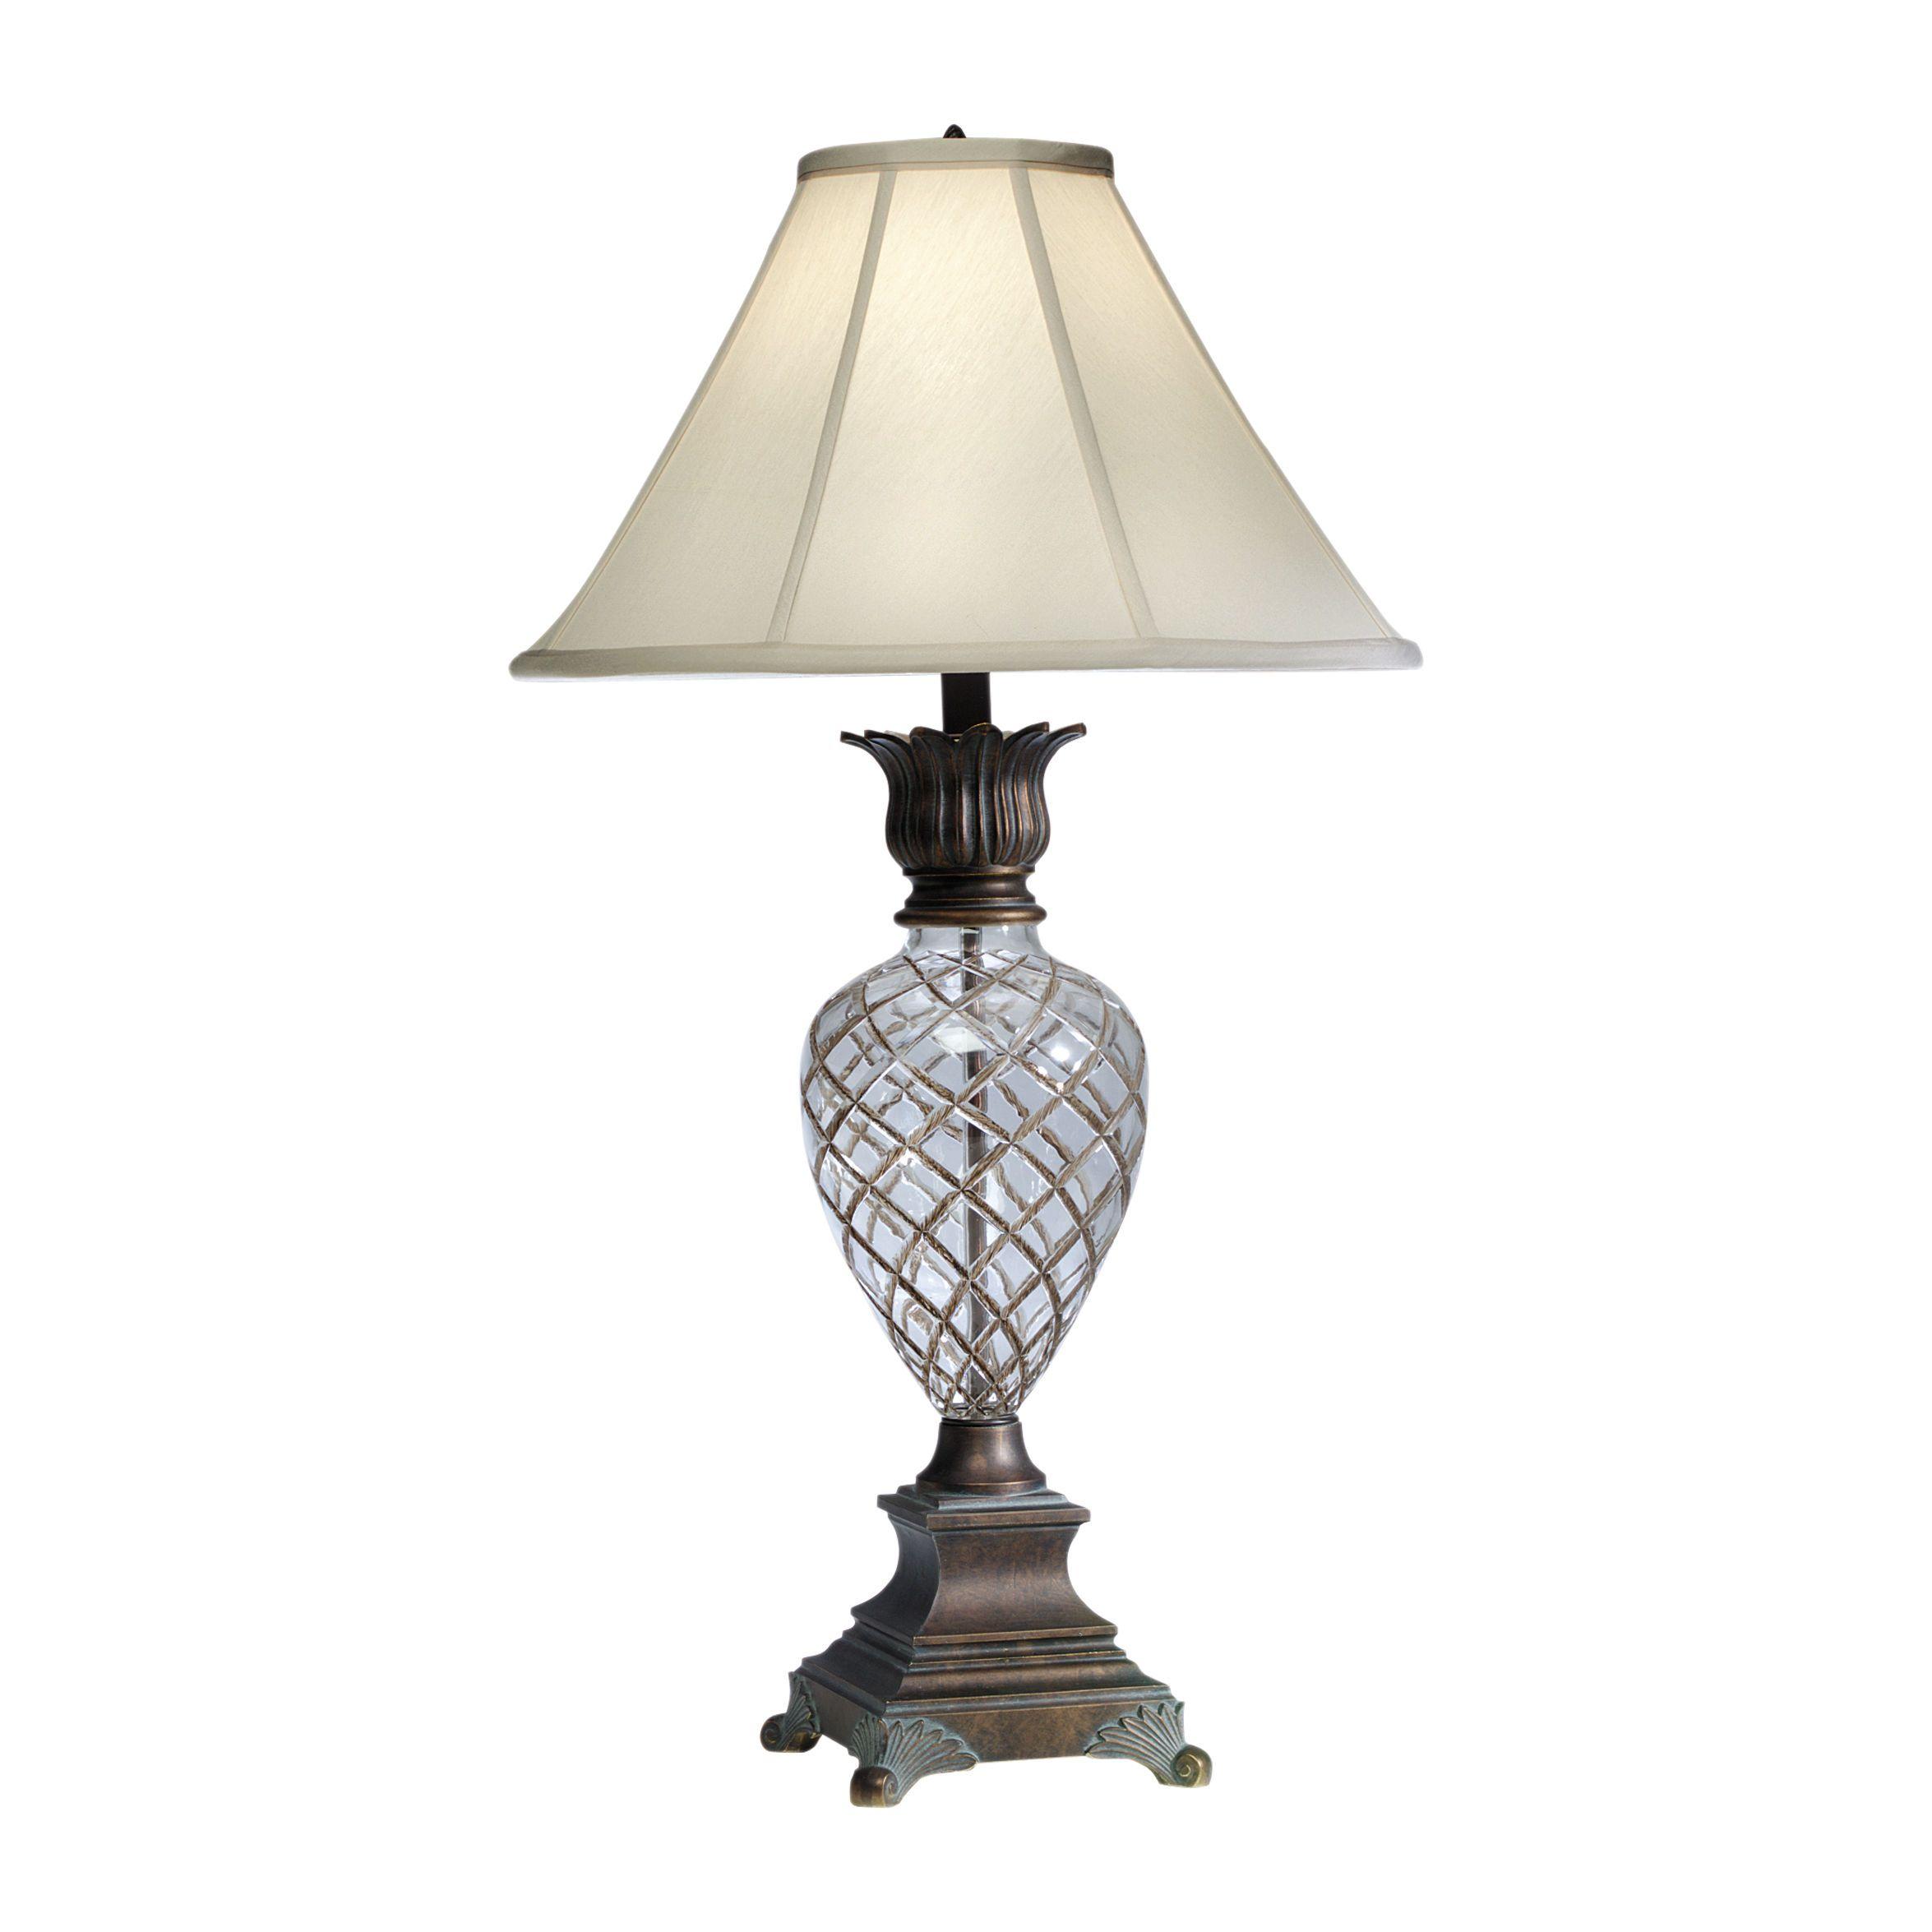 Pineapple Bedroom Furniture Vintage Pineapple Table Lamp Ethan Allen Us Bedroom